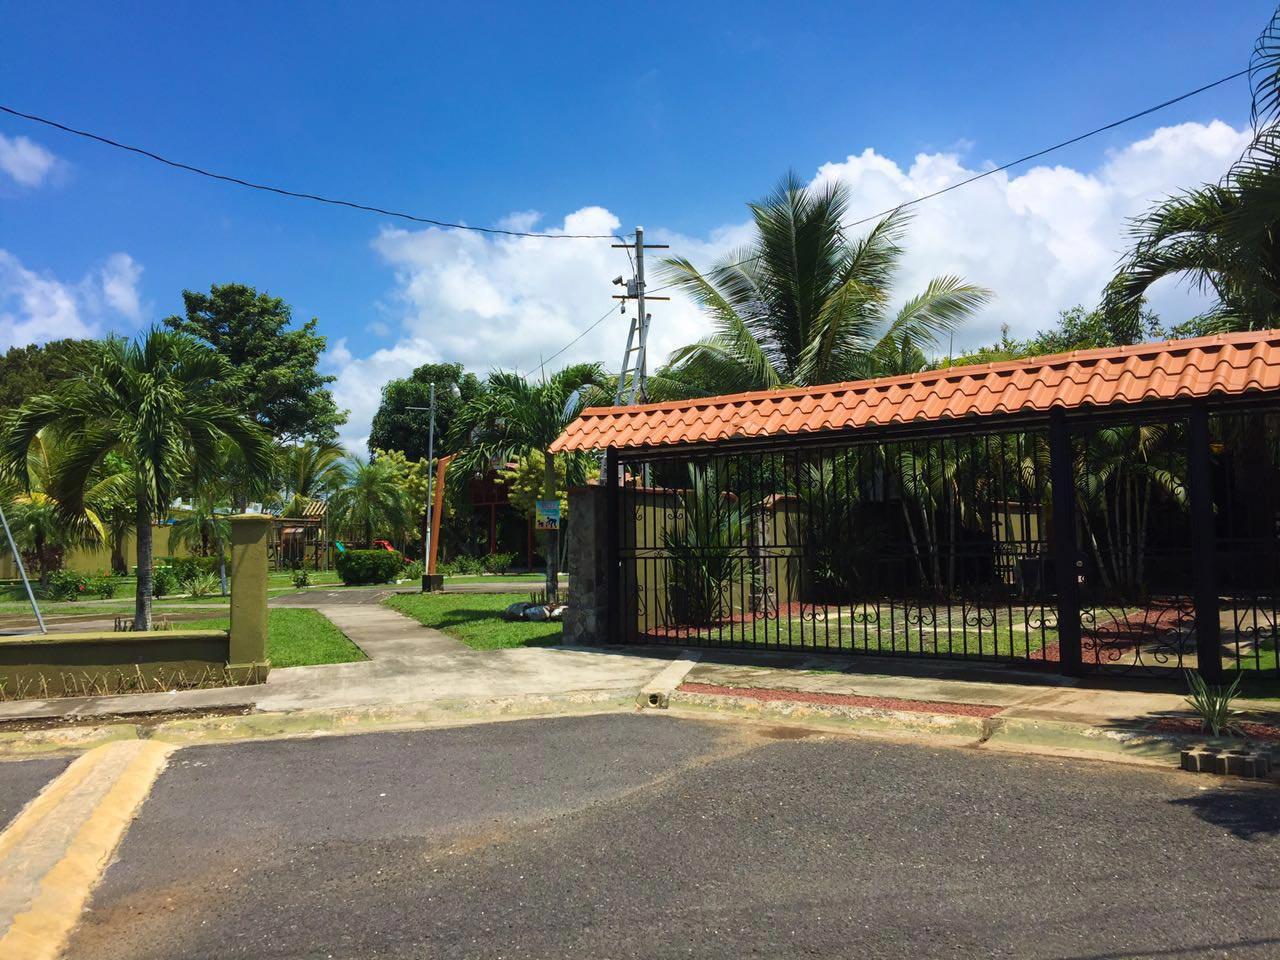 Jaco Costa Rica, Jaco beach condos, ocean front community, turnkey, pool, beachfront, Jaco Real Estate